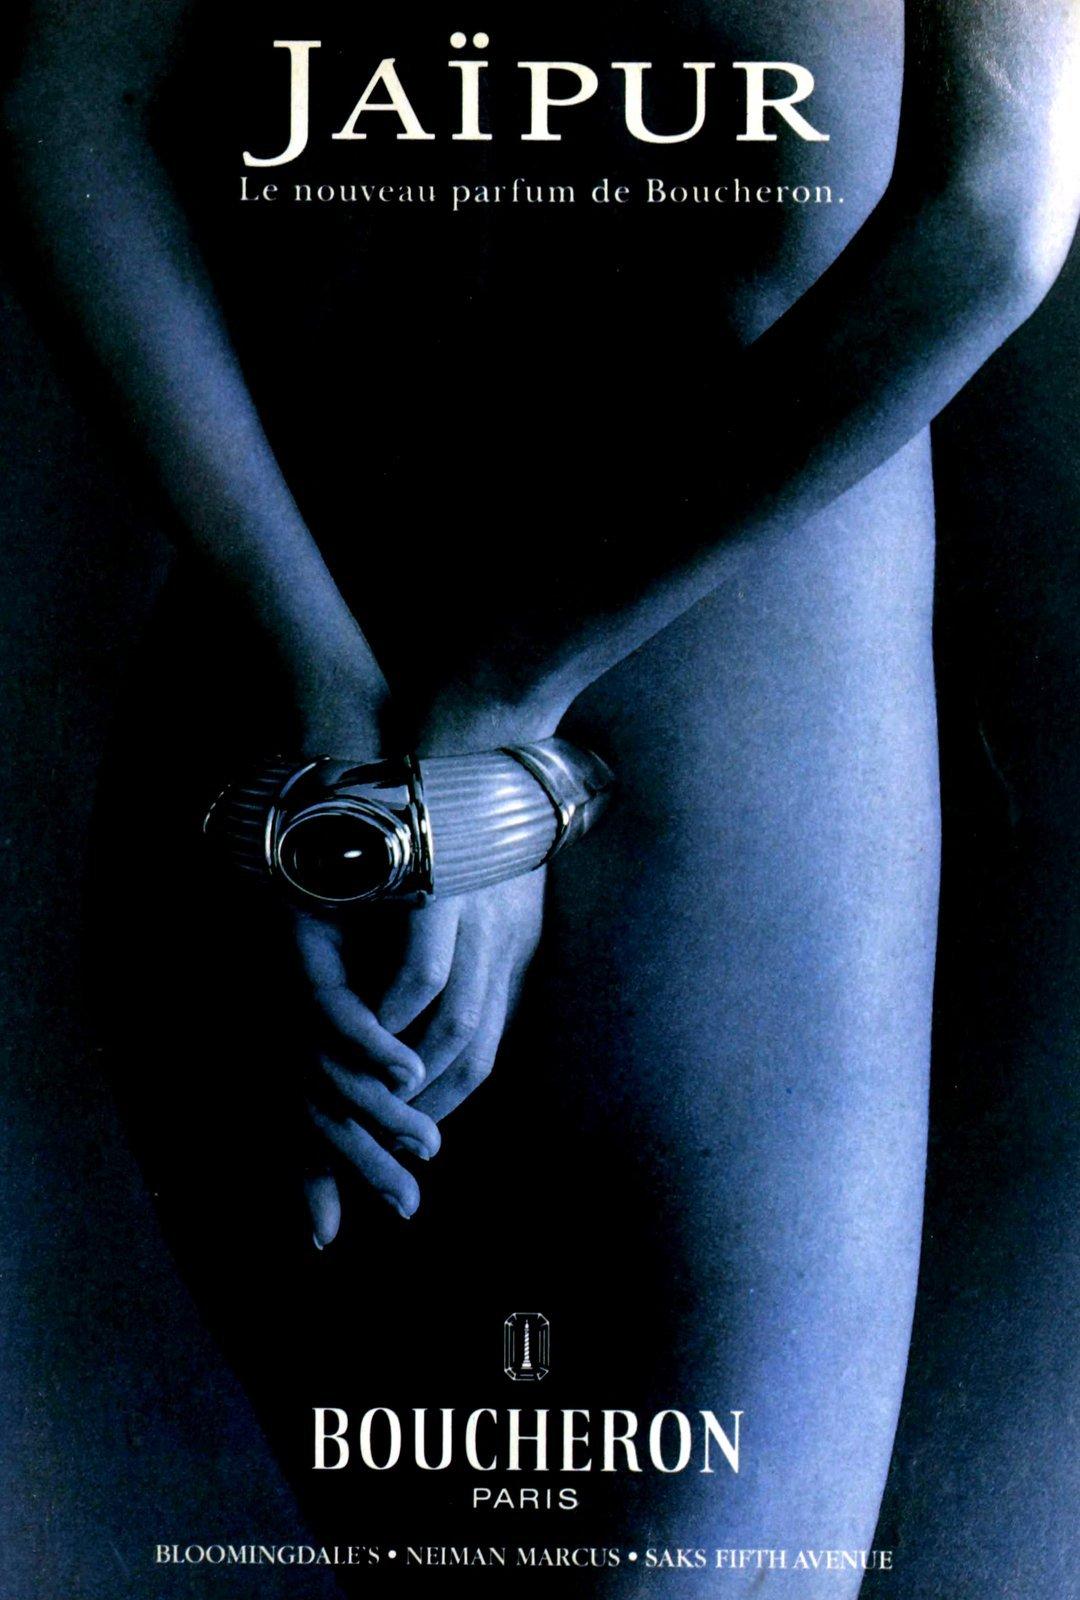 Jaipur perfume by Boucheron (1995) at ClickAmericana com